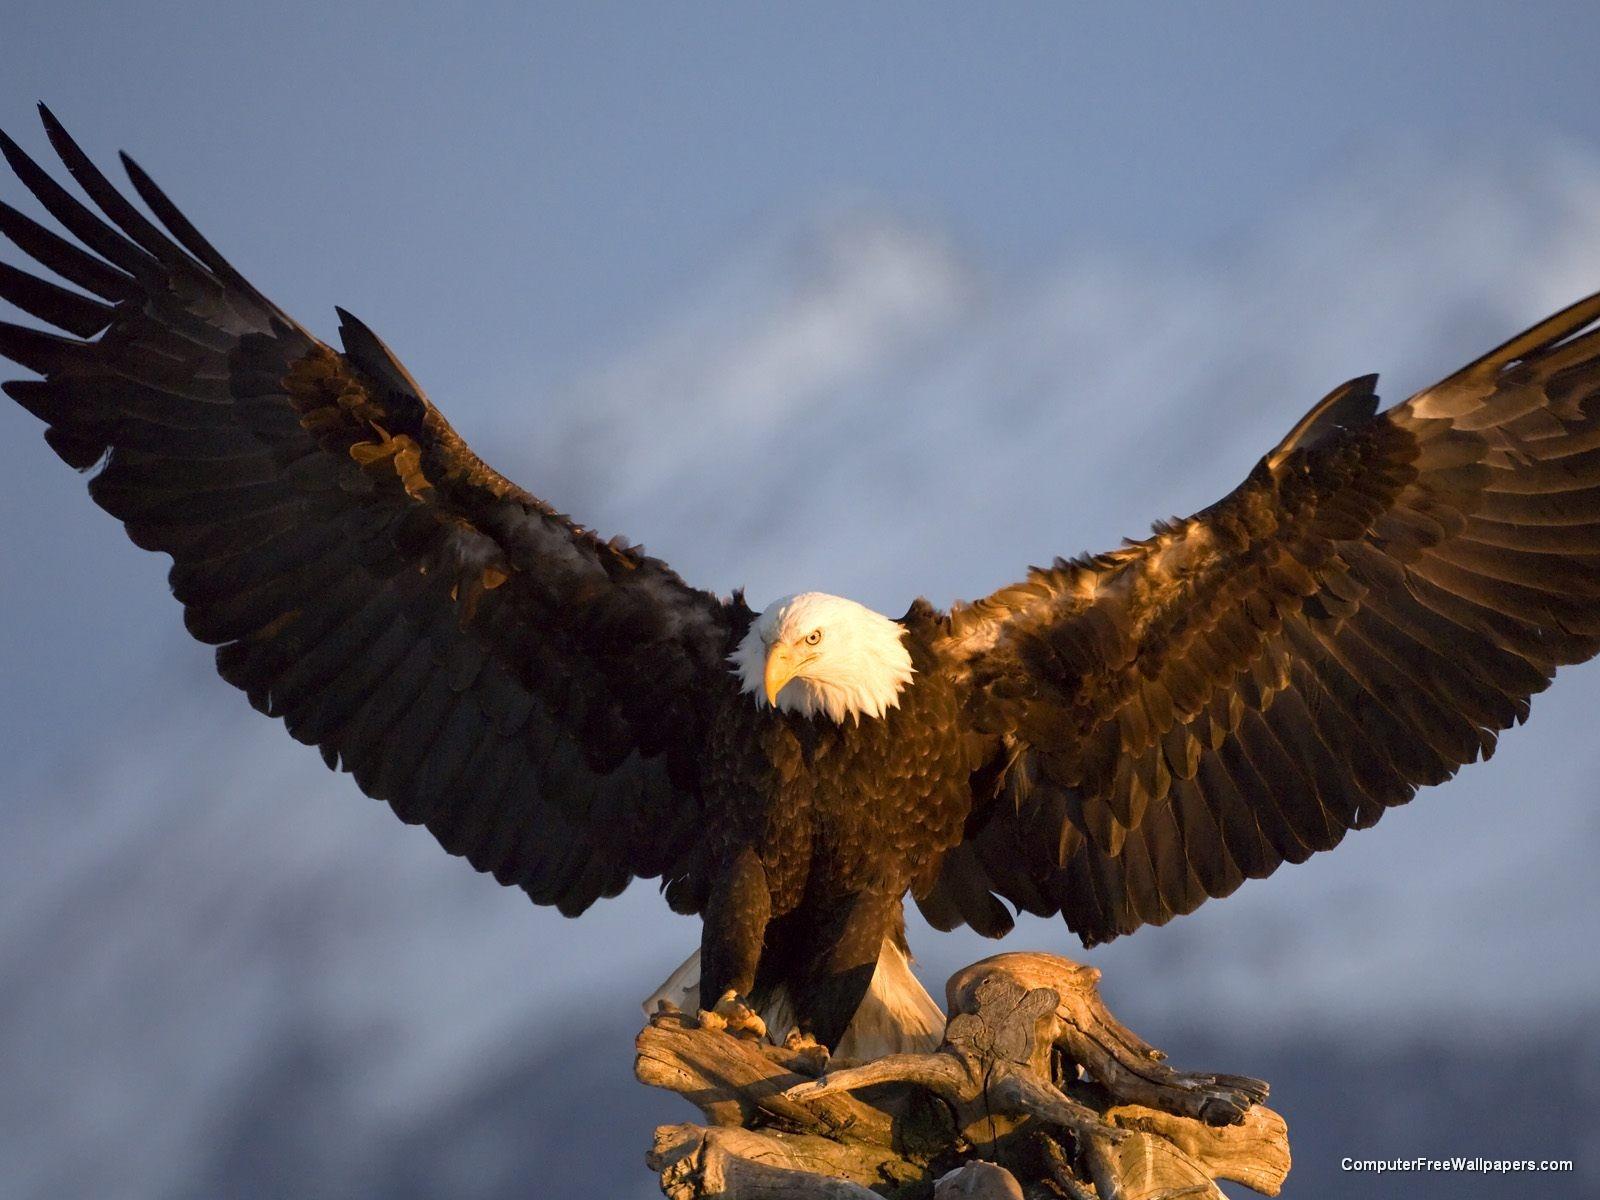 http://3.bp.blogspot.com/-nnvJ7L3DiK4/TeL-gCCaAoI/AAAAAAAAHRU/WJI-Kco2mPw/s1600/bald-eagle5.jpeg